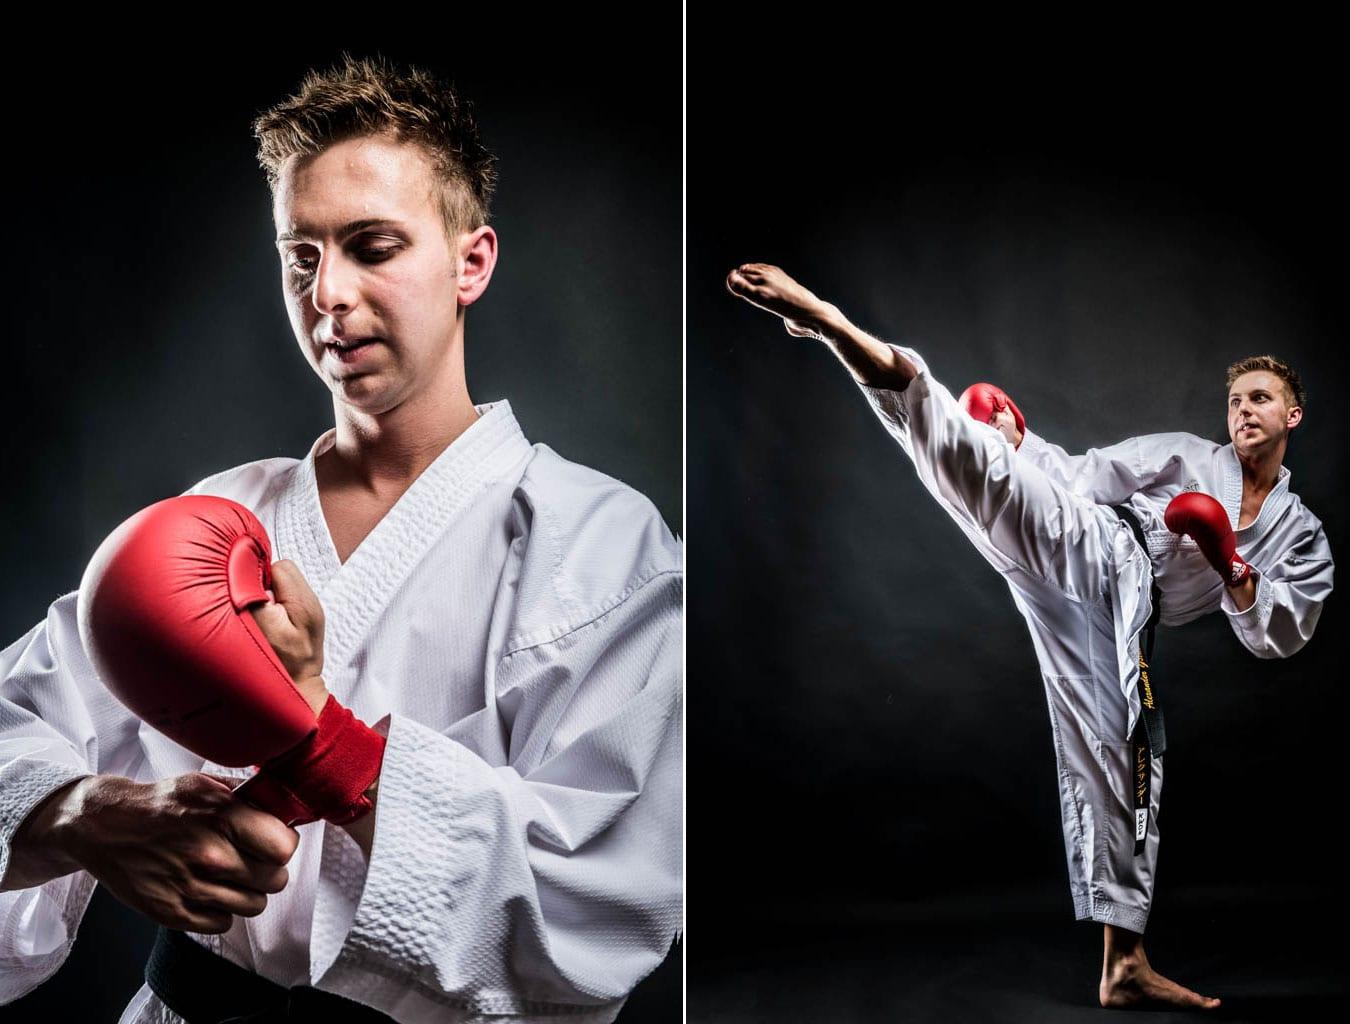 Athletenportrait_Karate_Sportfotograf_Salzburg_LorenzMasser0006